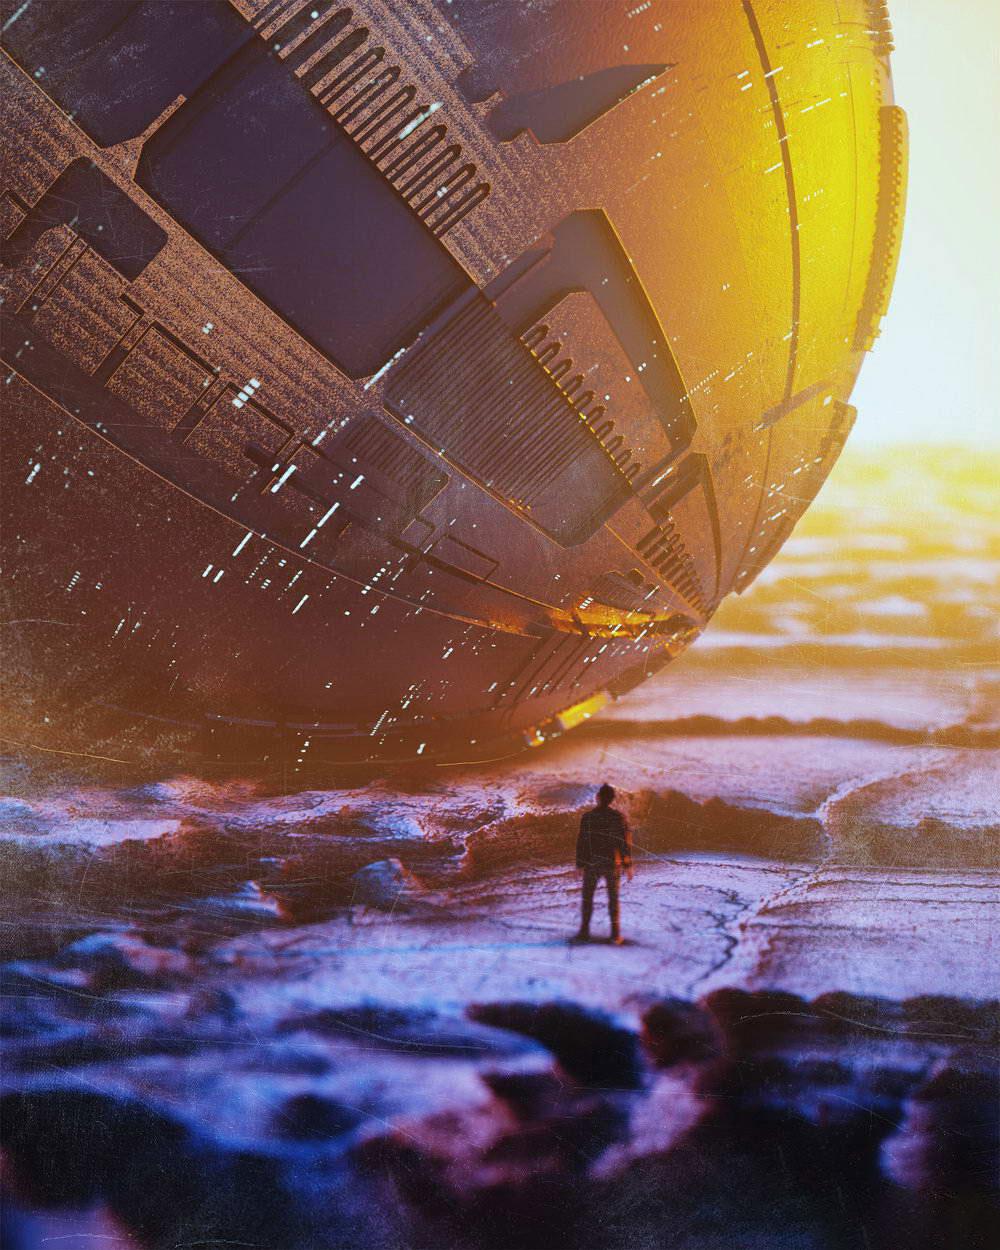 Octane素材渲染降落外星球巨大宇宙飞船灯光场景C4D模型工程